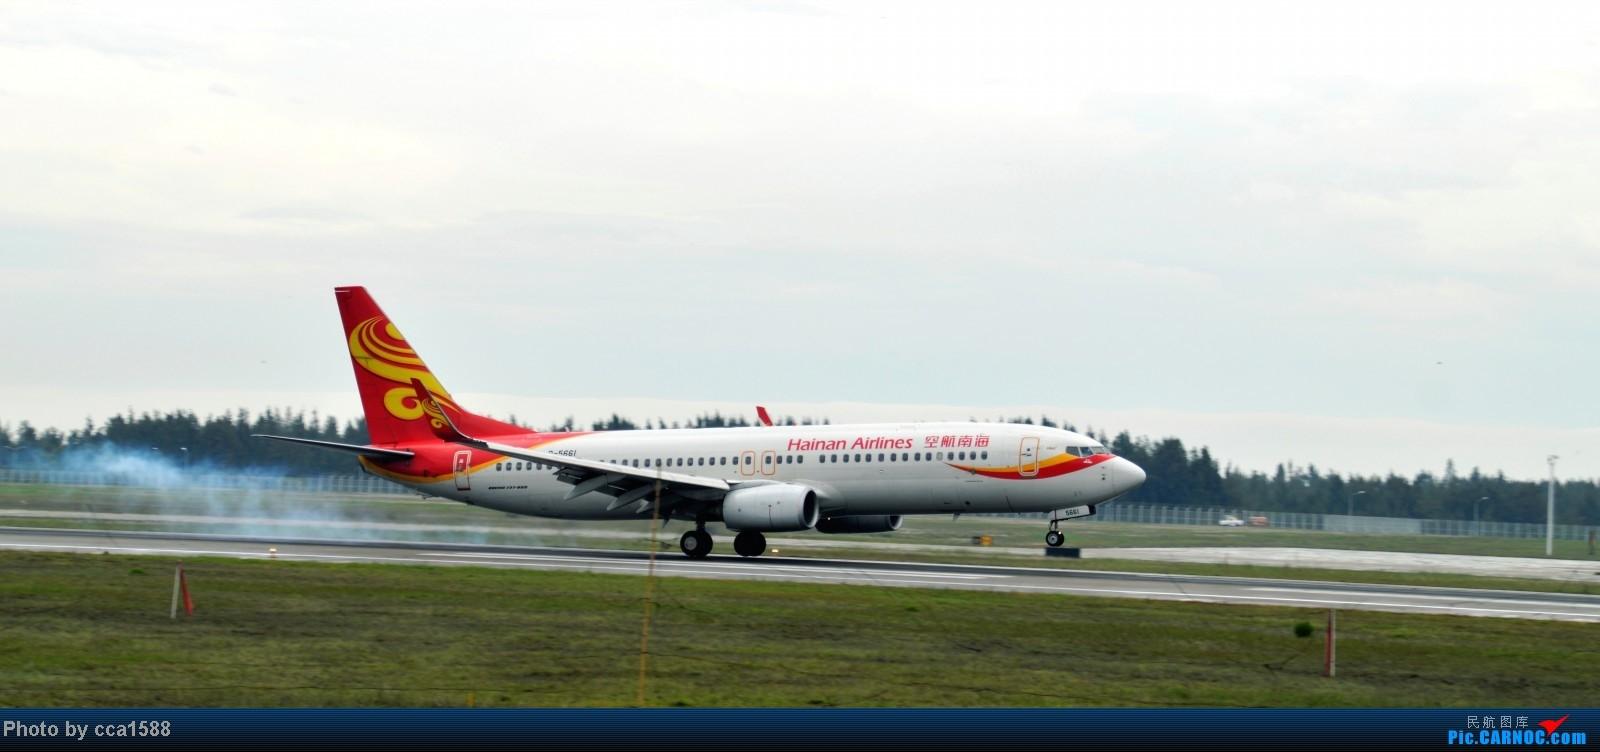 Re:[原创]4.26FOC拍机--烂天出好机,各种奇葩货~~ BOEING 737-800 B-5661 中国福州长乐机场